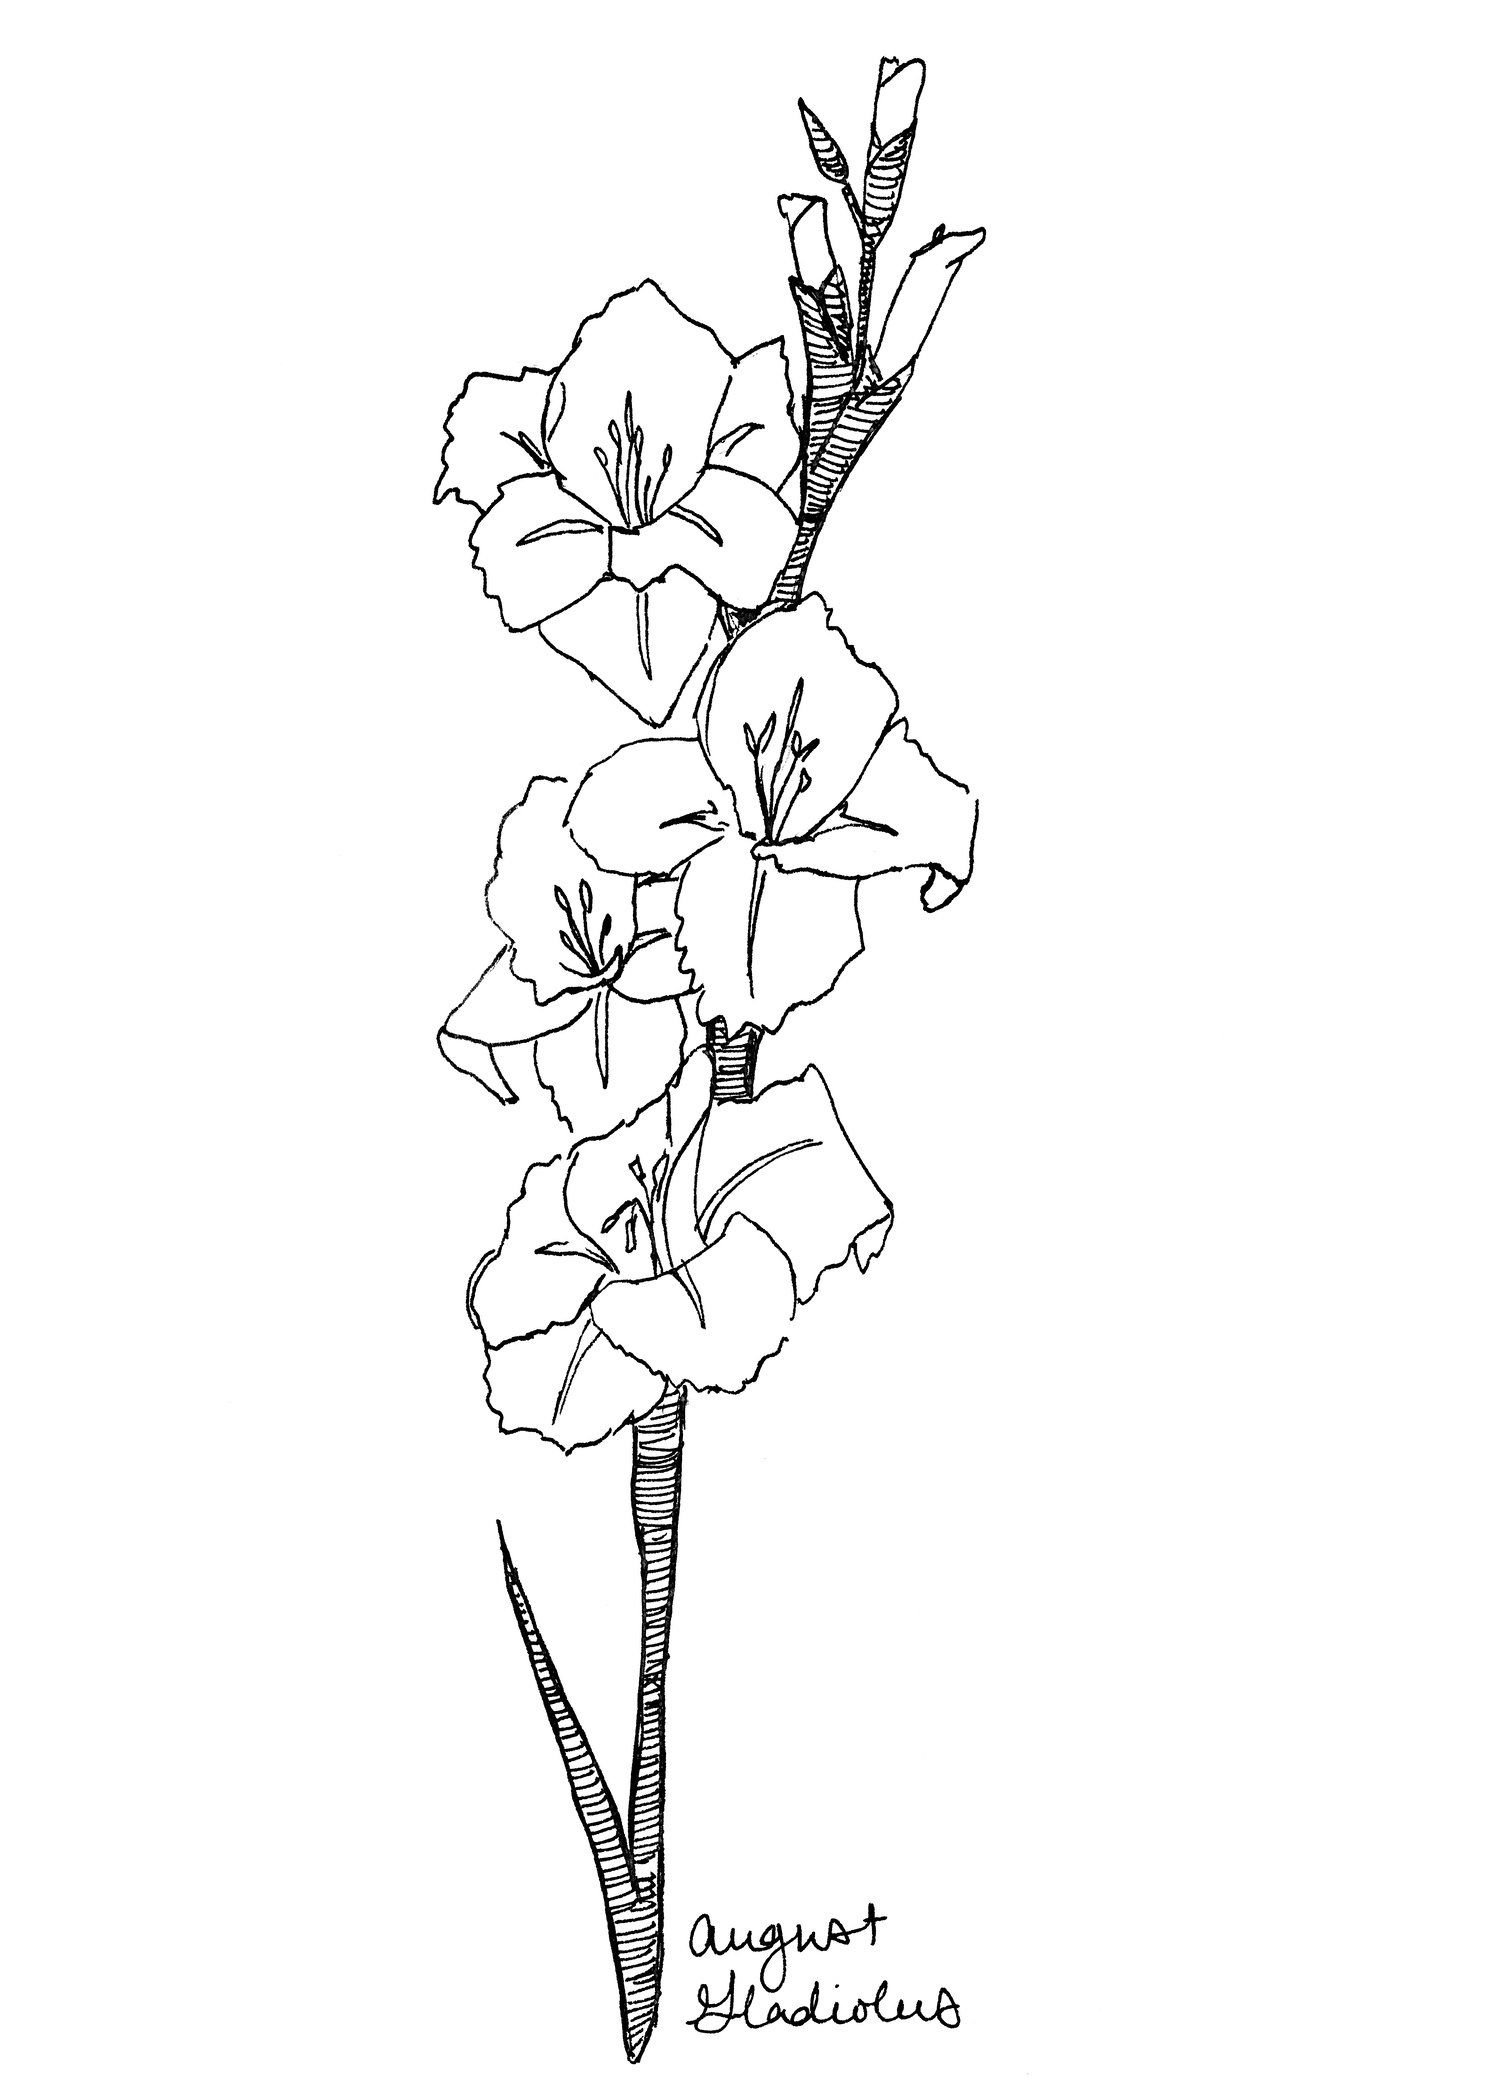 August Gladiolus Art Print Birth Flower Print Gladiolus Etsy Gladiolus Flower Tattoos August Flower Tattoo Birth Flowers